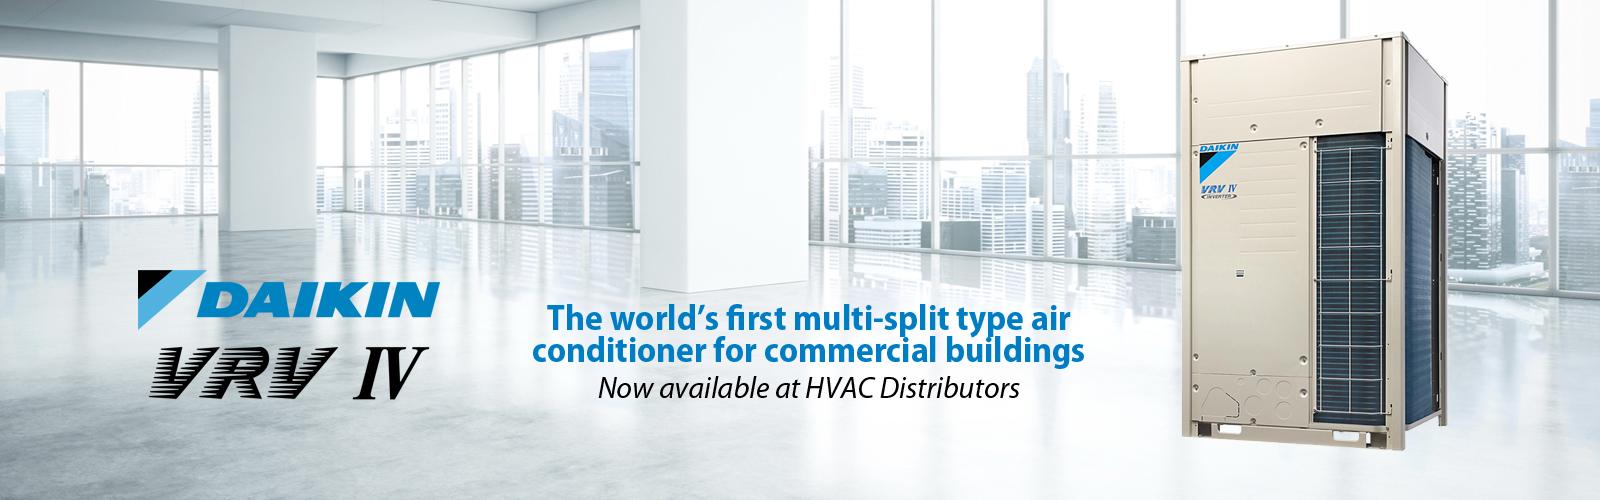 HVAC Distributors | Partners For Success